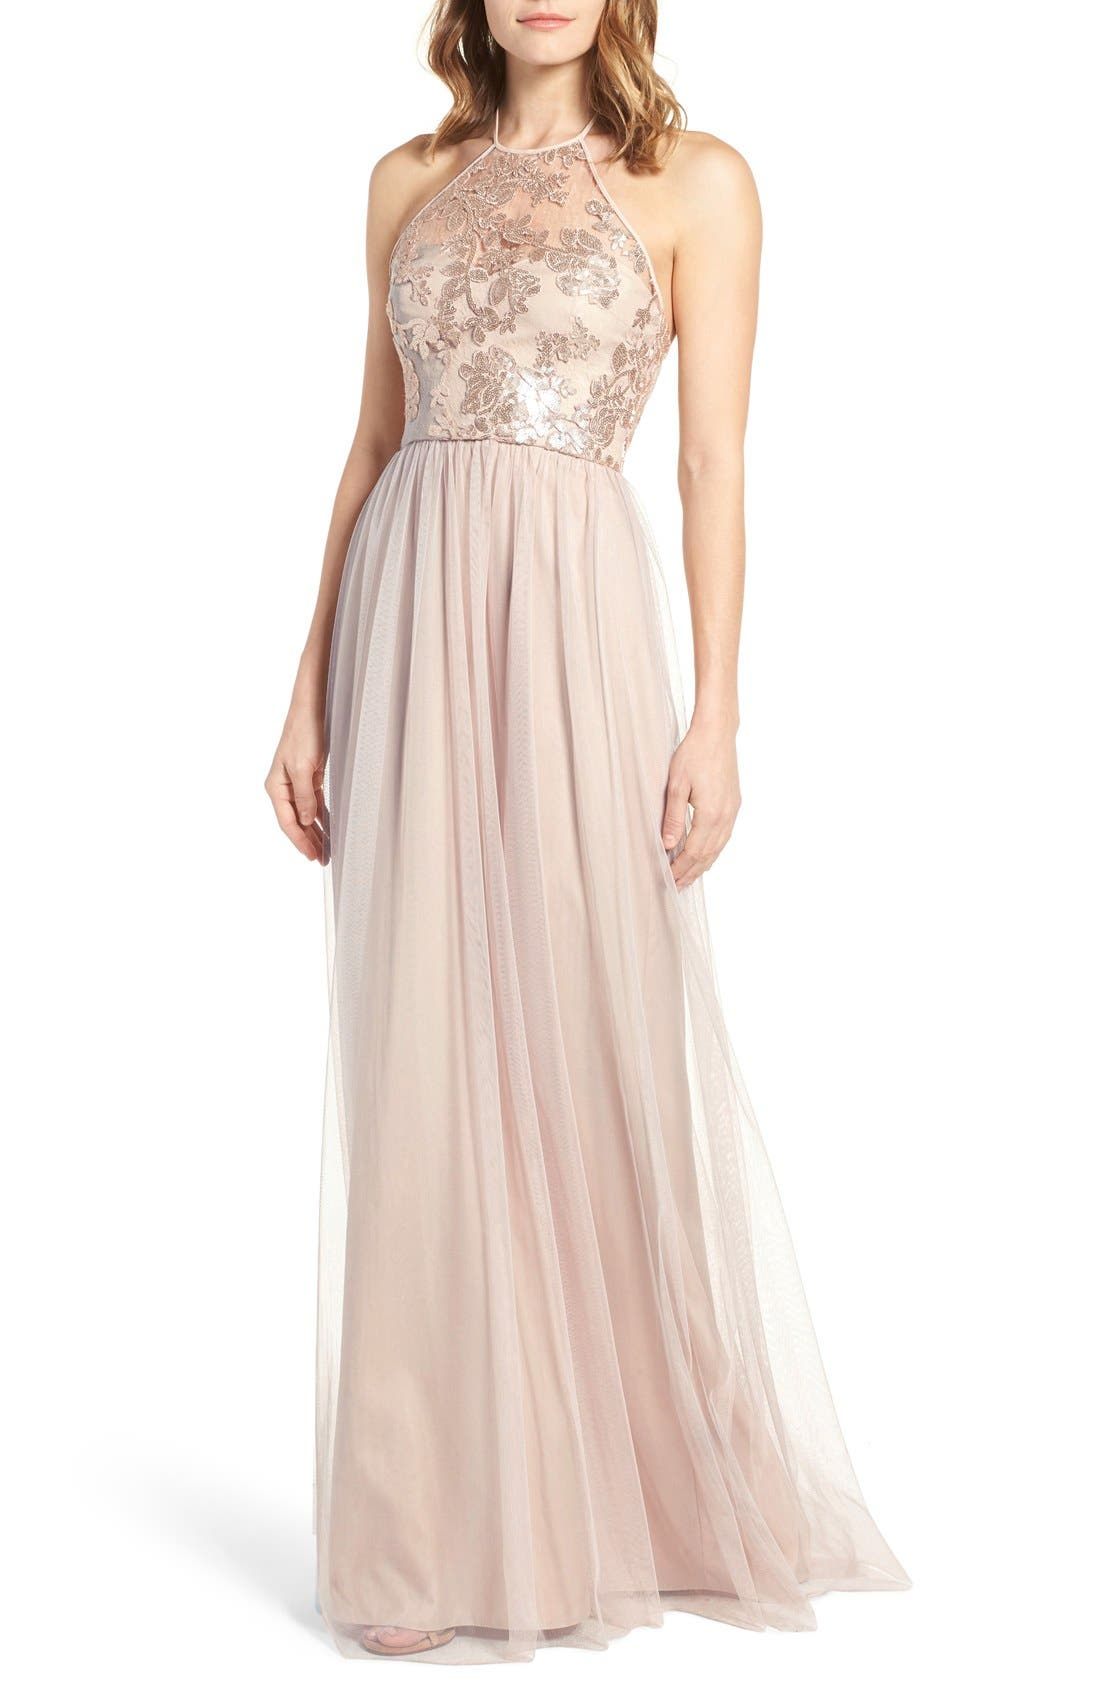 Sheridan Sequin Halter Dress,                             Main thumbnail 1, color,                             LATTE